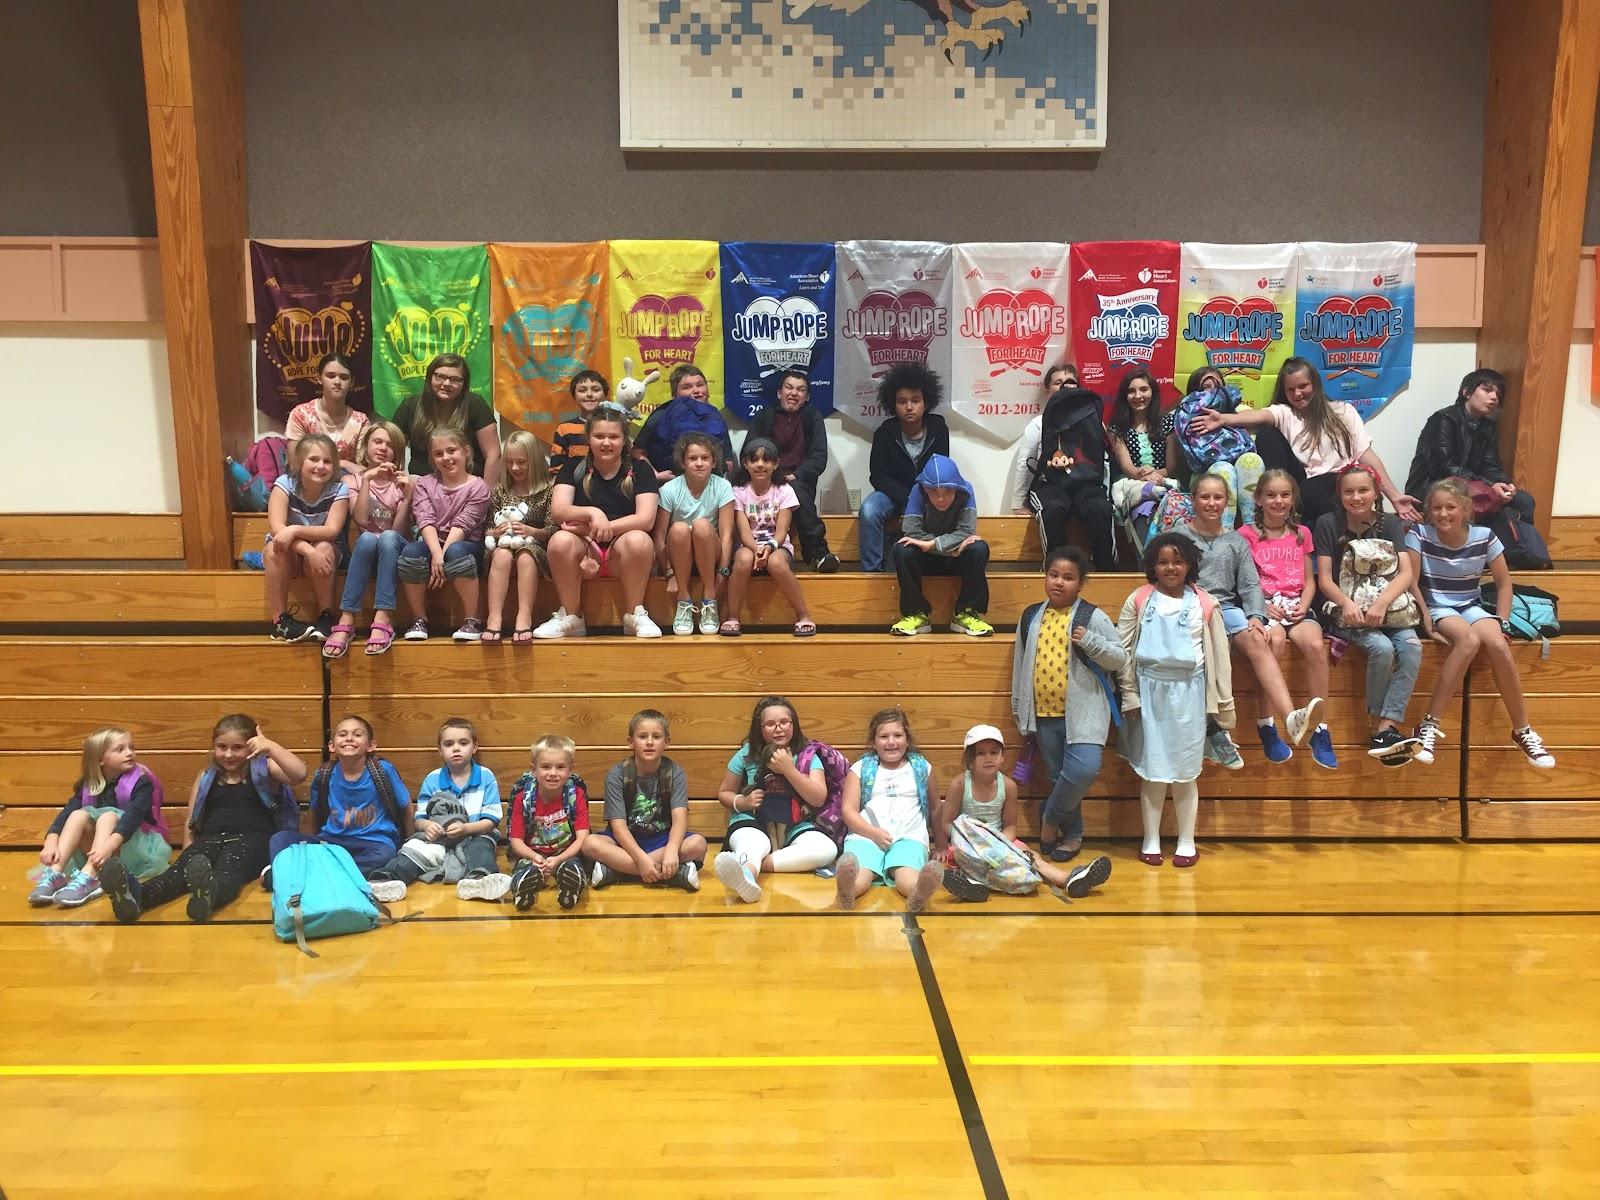 school photo 2017-2018.JPG